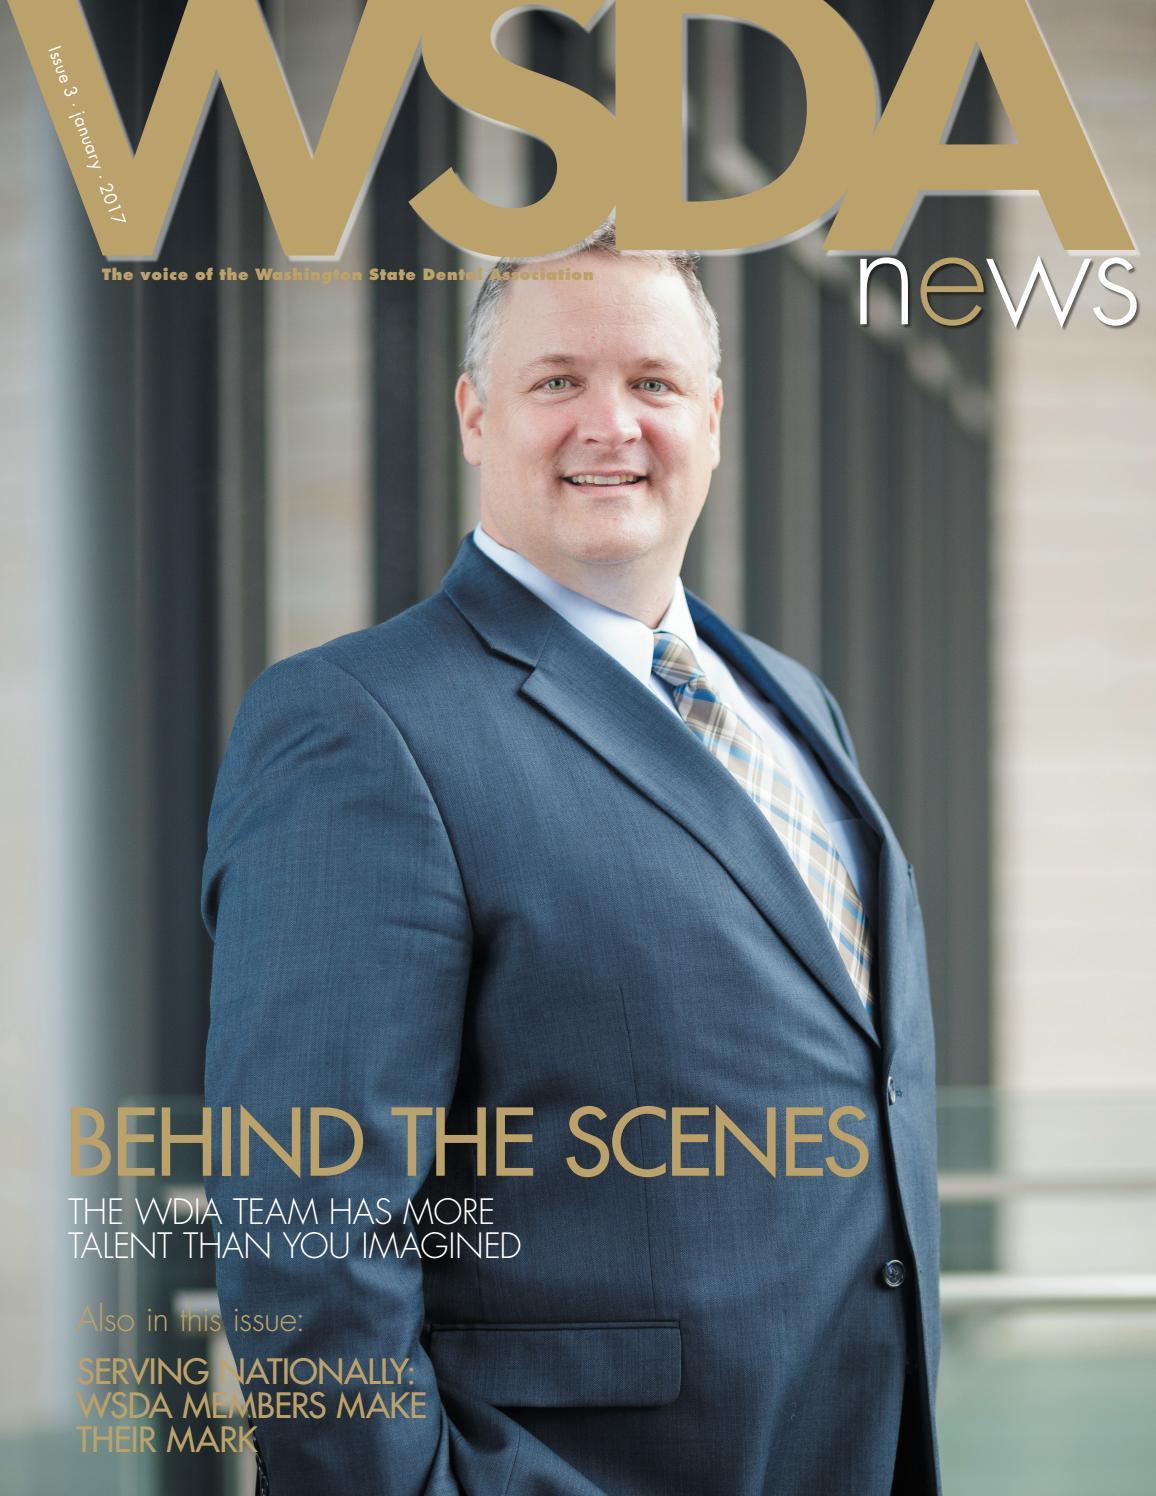 WSDA NEWS ISSUE 3 · JANUARY 2017 by Kainoa Trotter - issuu